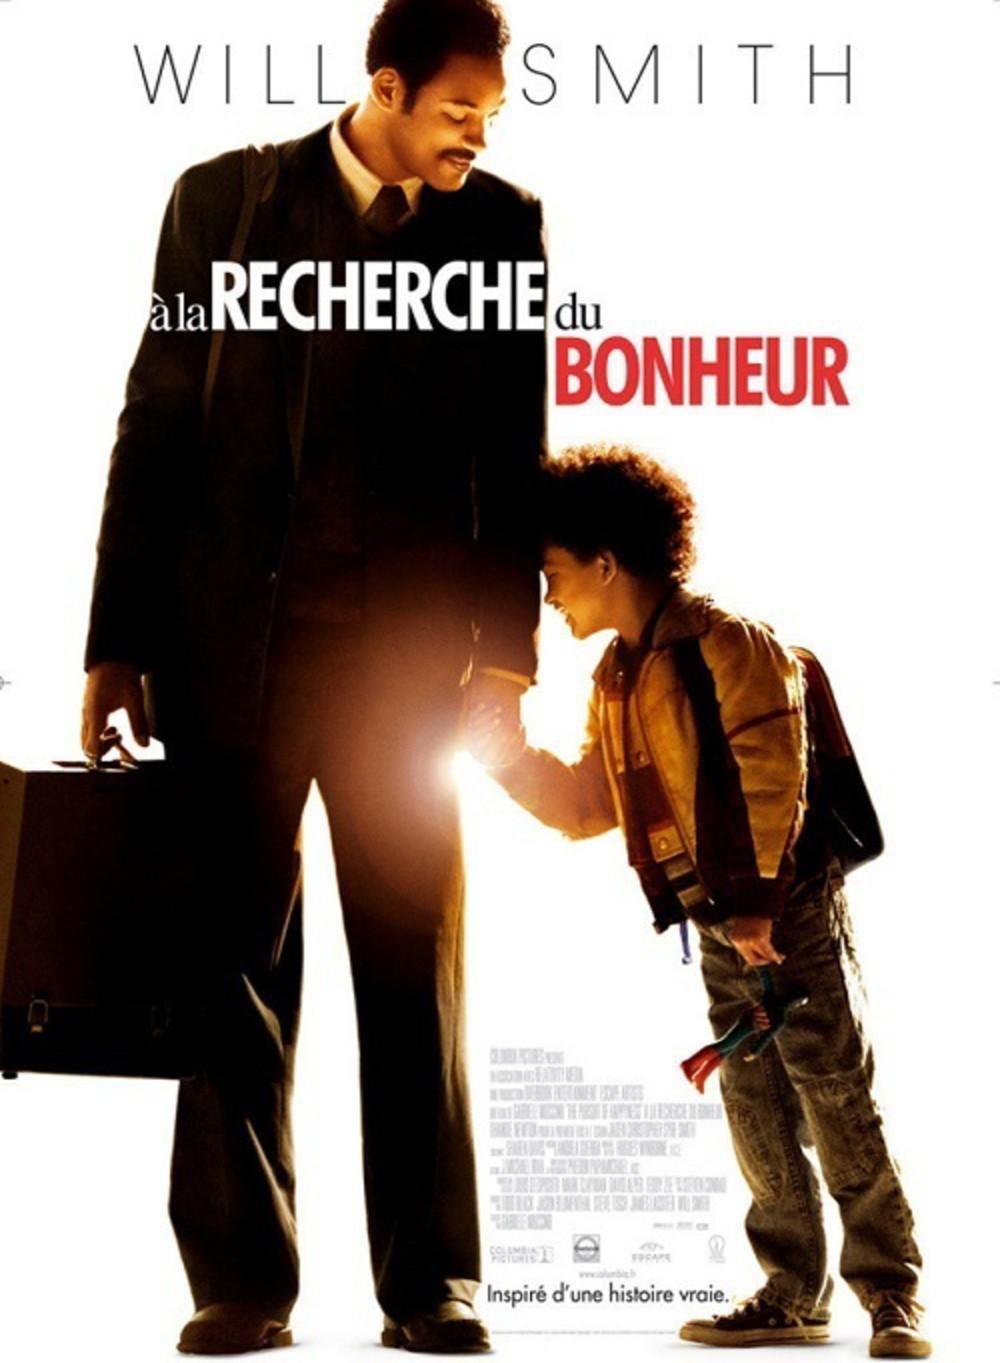 Zone Telechargement Site De Telechargement Gratuit Inspirational Movies The Pursuit Of Happyness Good Movies